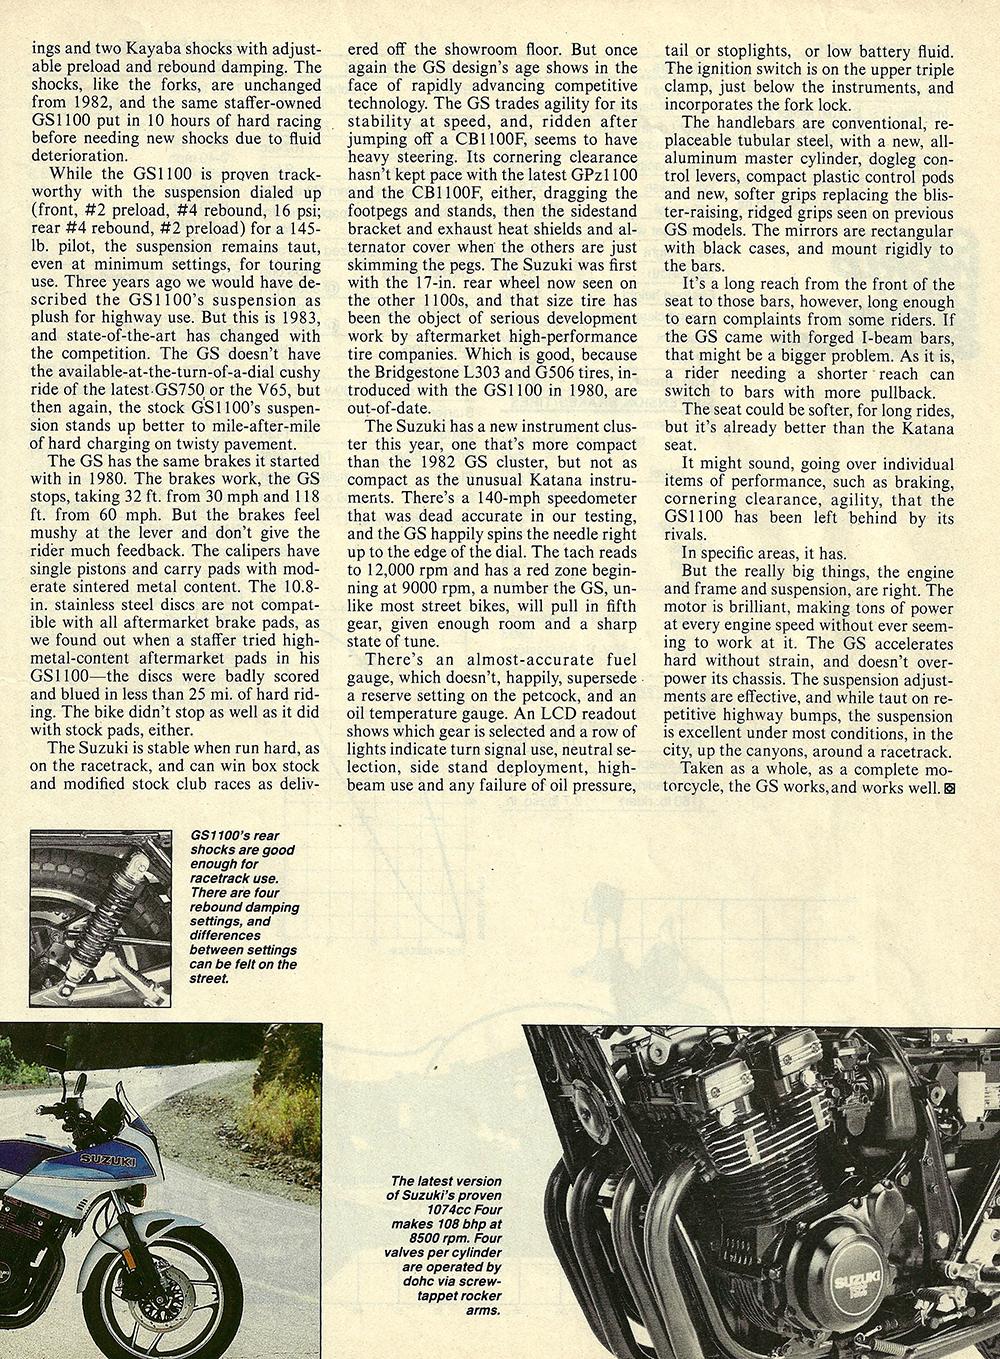 1983 Suzuki GS1100E road test — Ye Olde Cycle Shoppe